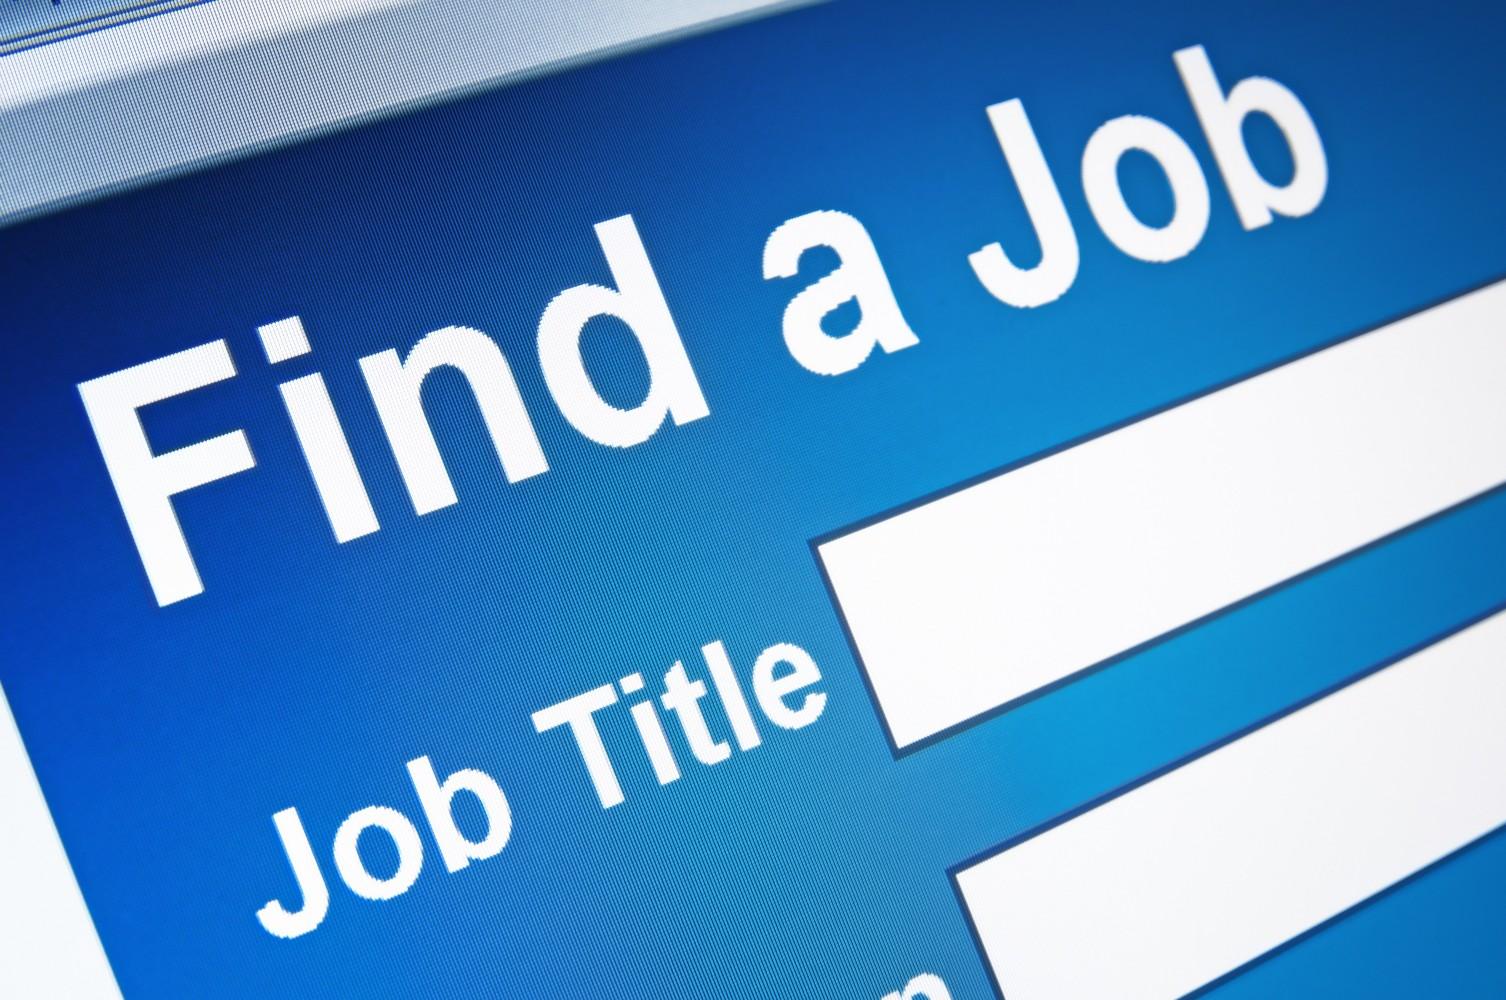 usa best job portal usa best job portal photo album by baronjsimpler usa best job portal